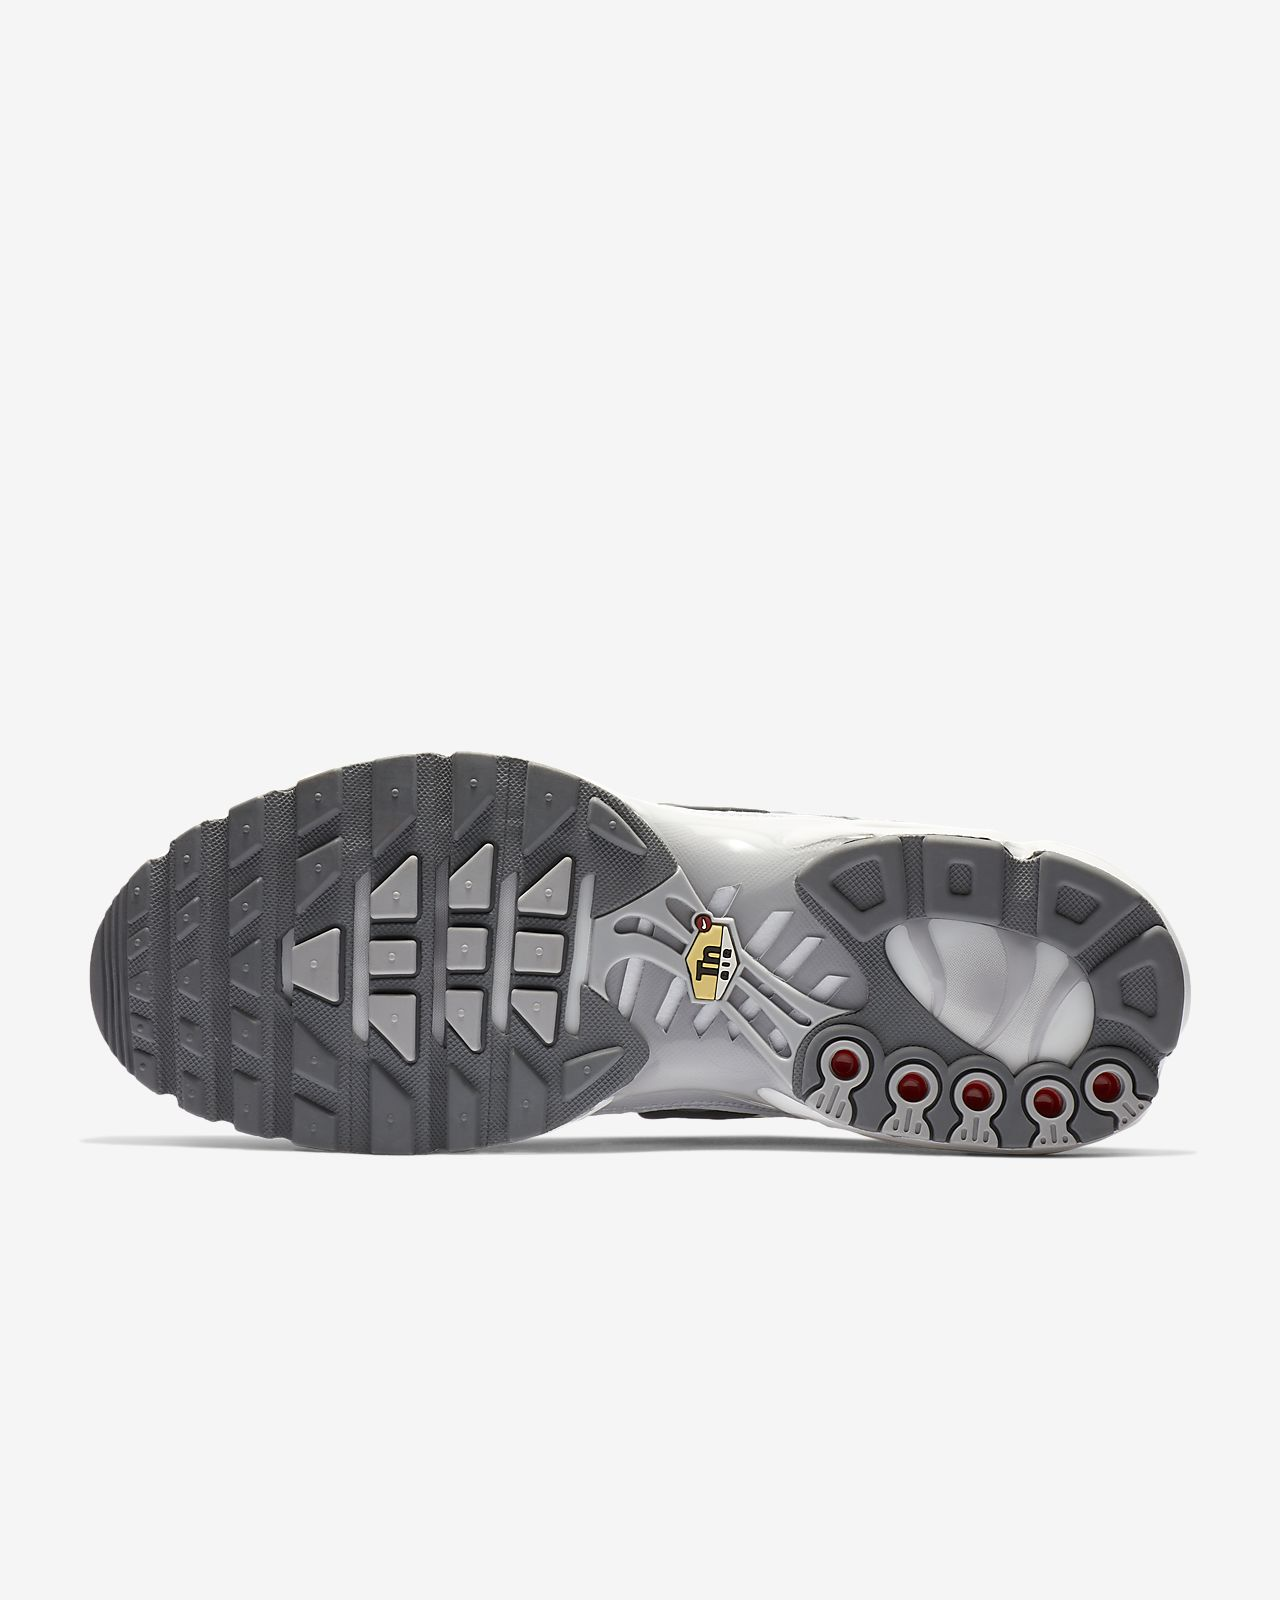 a4cd20a6979a8 Nike Air Max Plus Men s Shoe. Nike.com BE